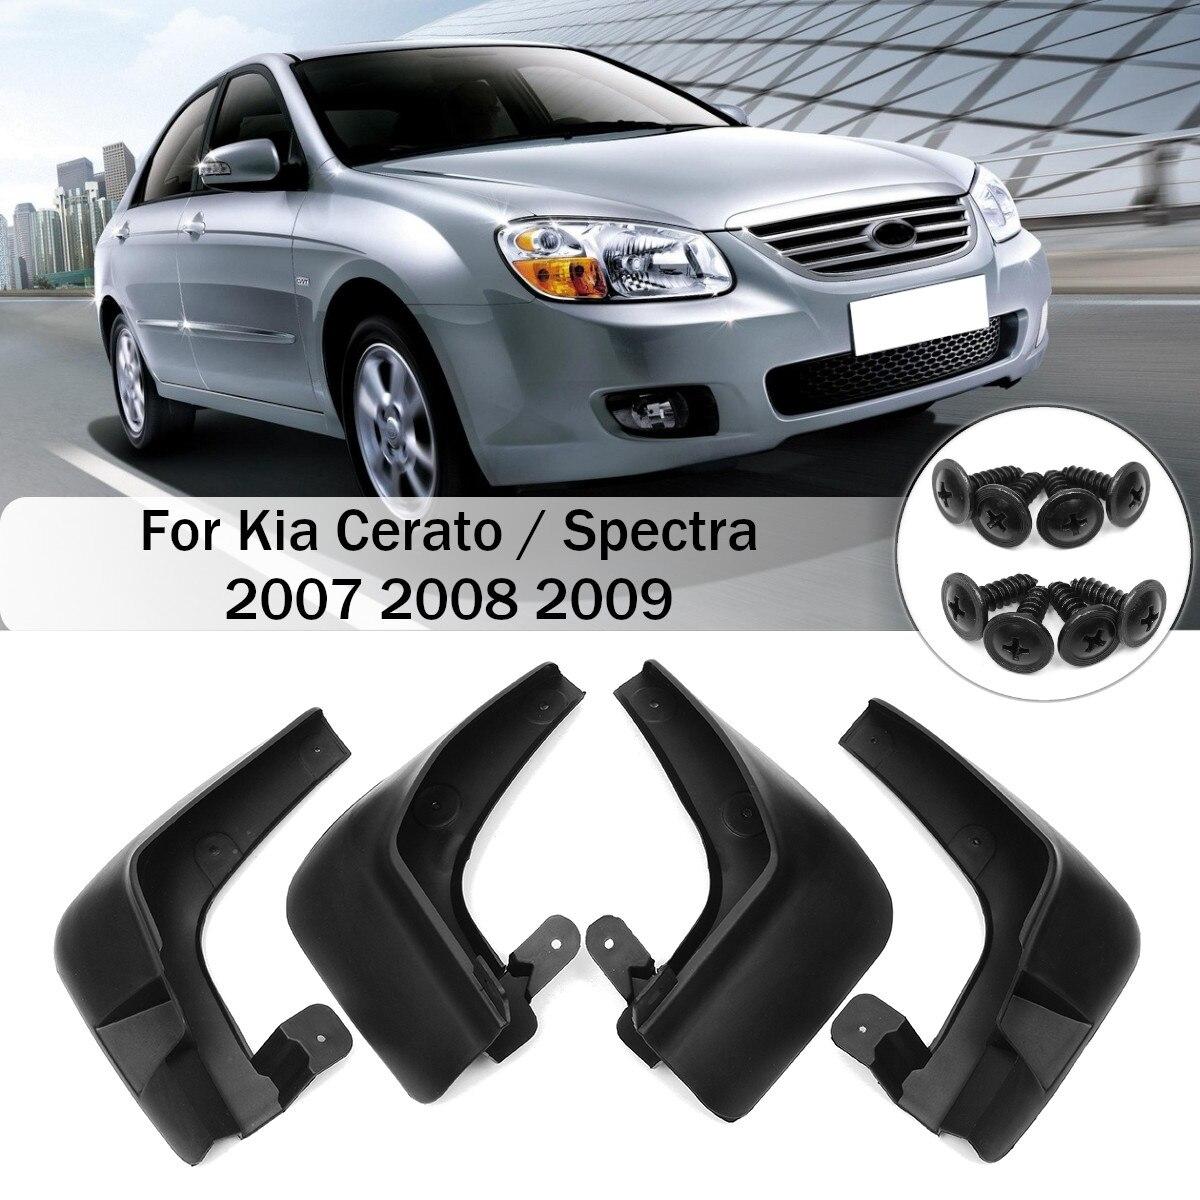 4pcs Car Mud Flaps Front Rear Fender Flares Splash Guards for Kia Cerato/Spectra 2007 2008 2009 Mudflaps Mudguards